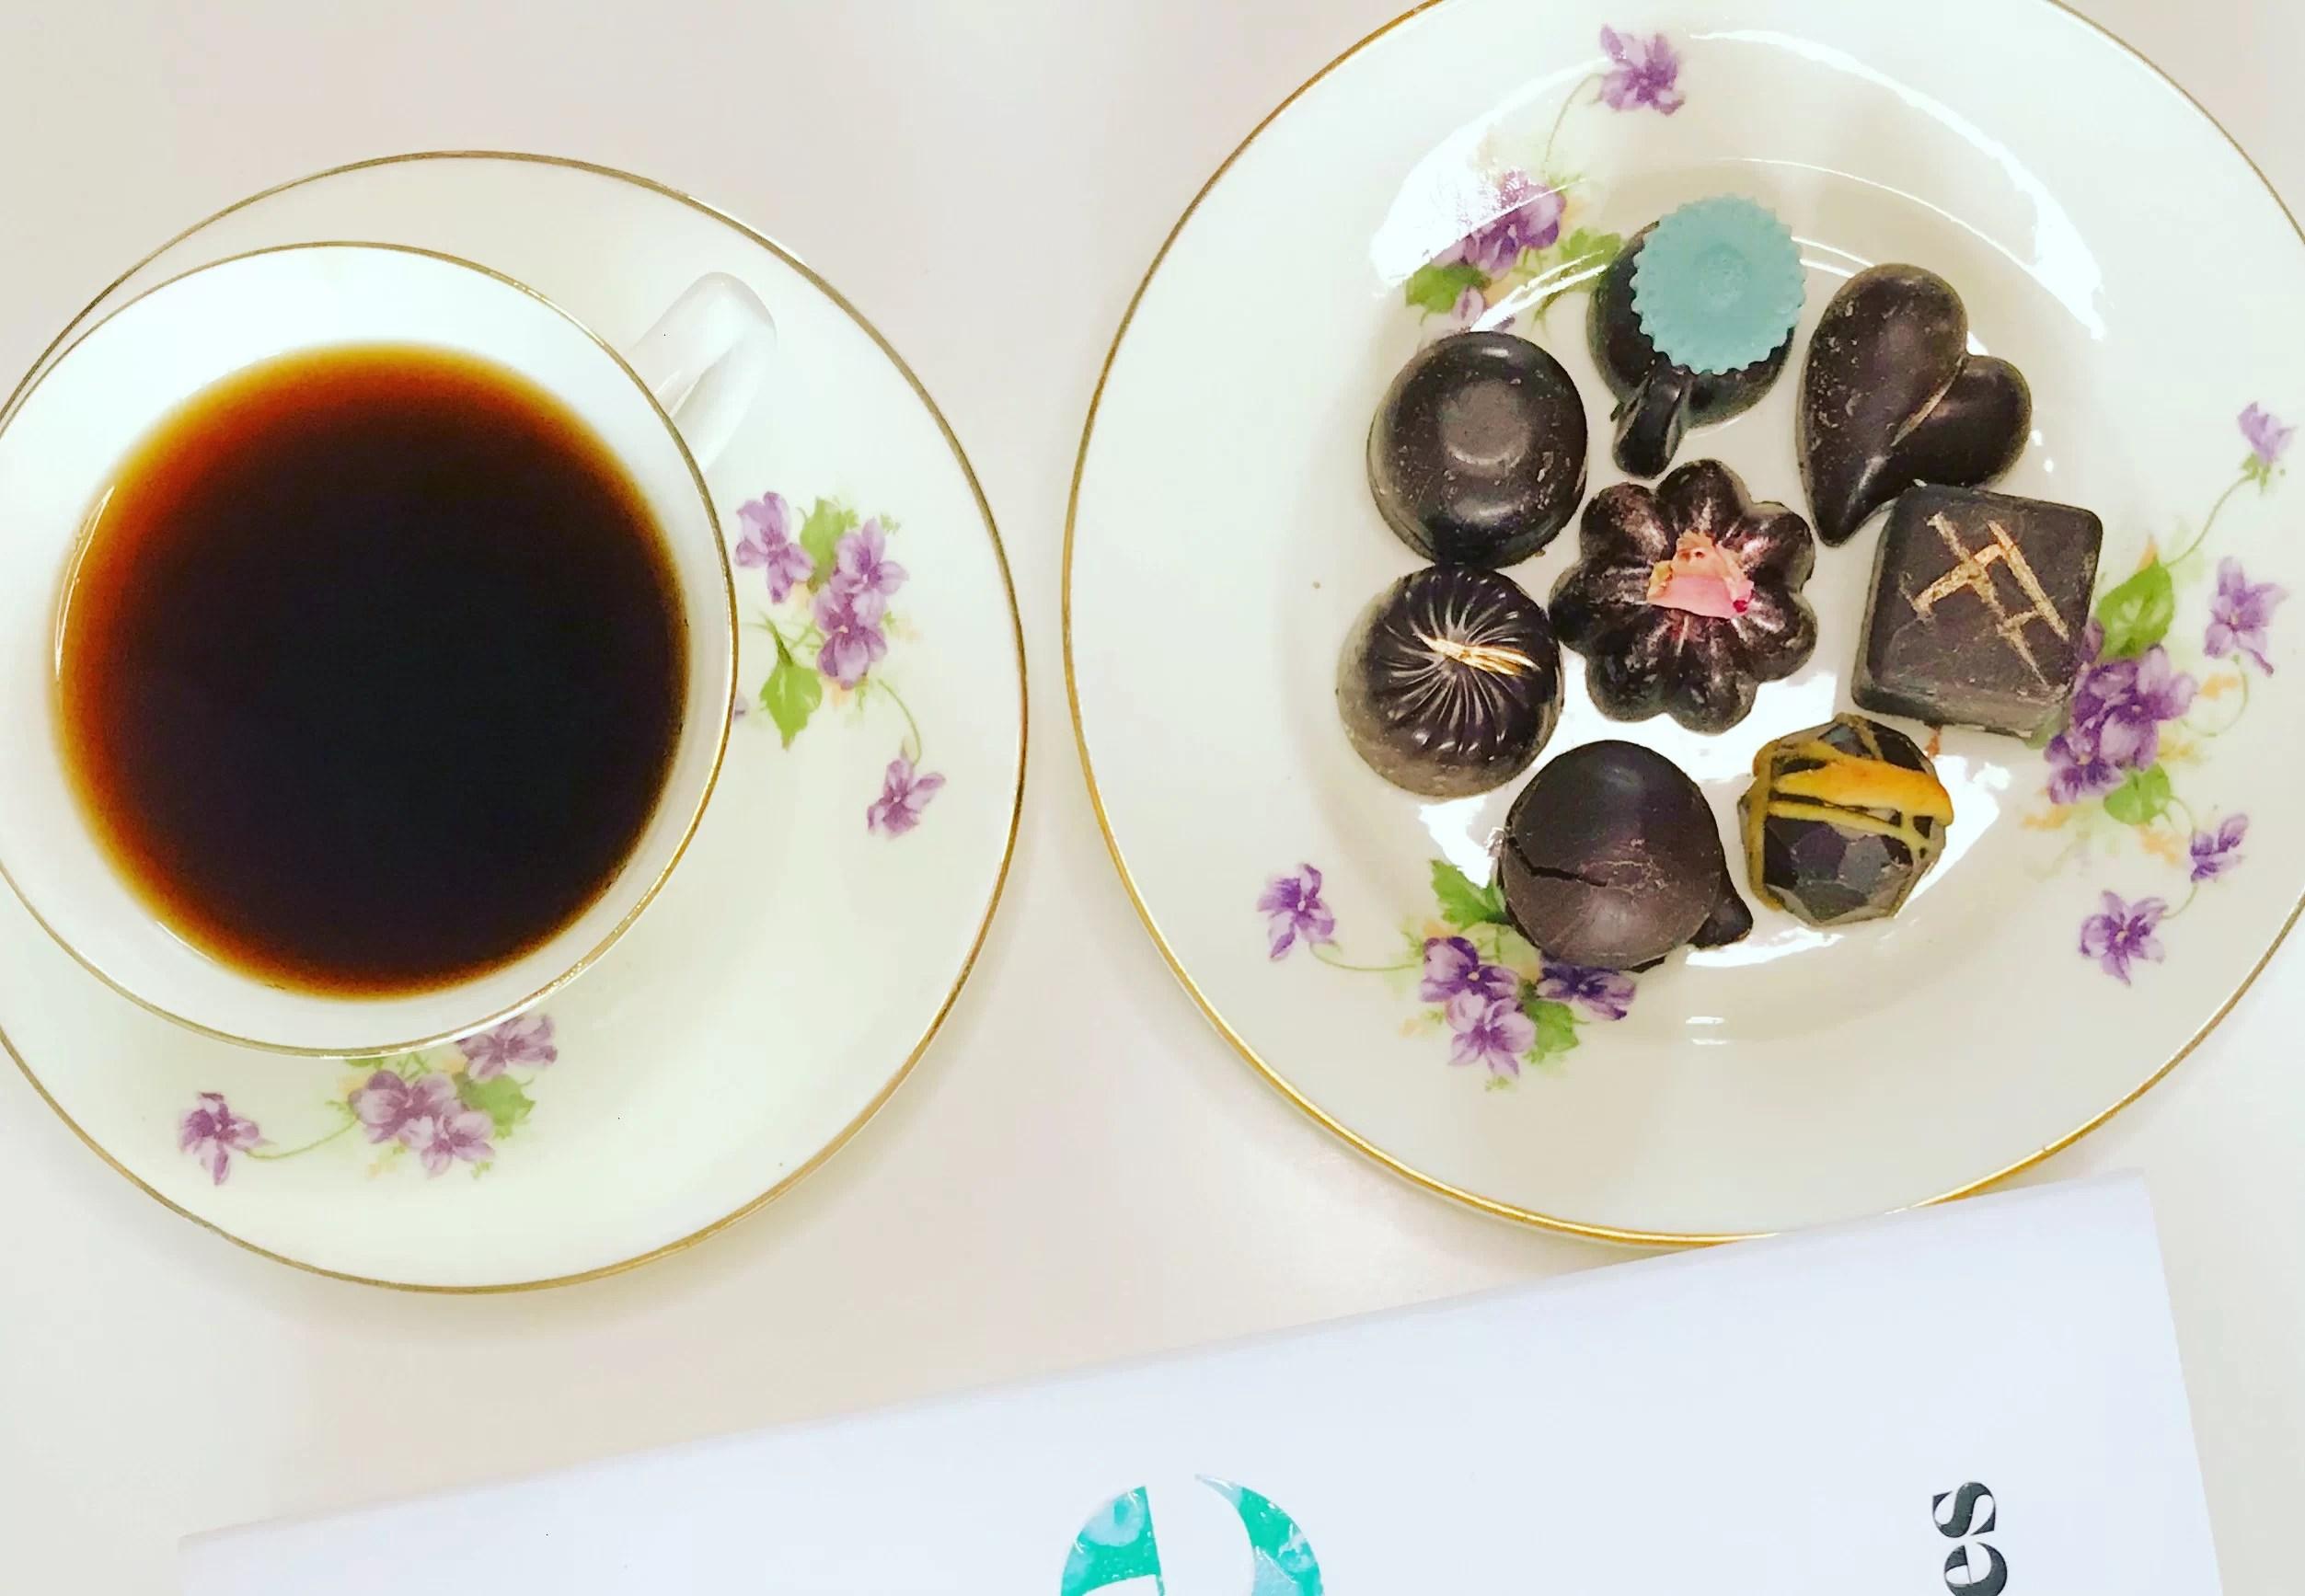 4 Reasons I Love nono Cocoa Chocolates